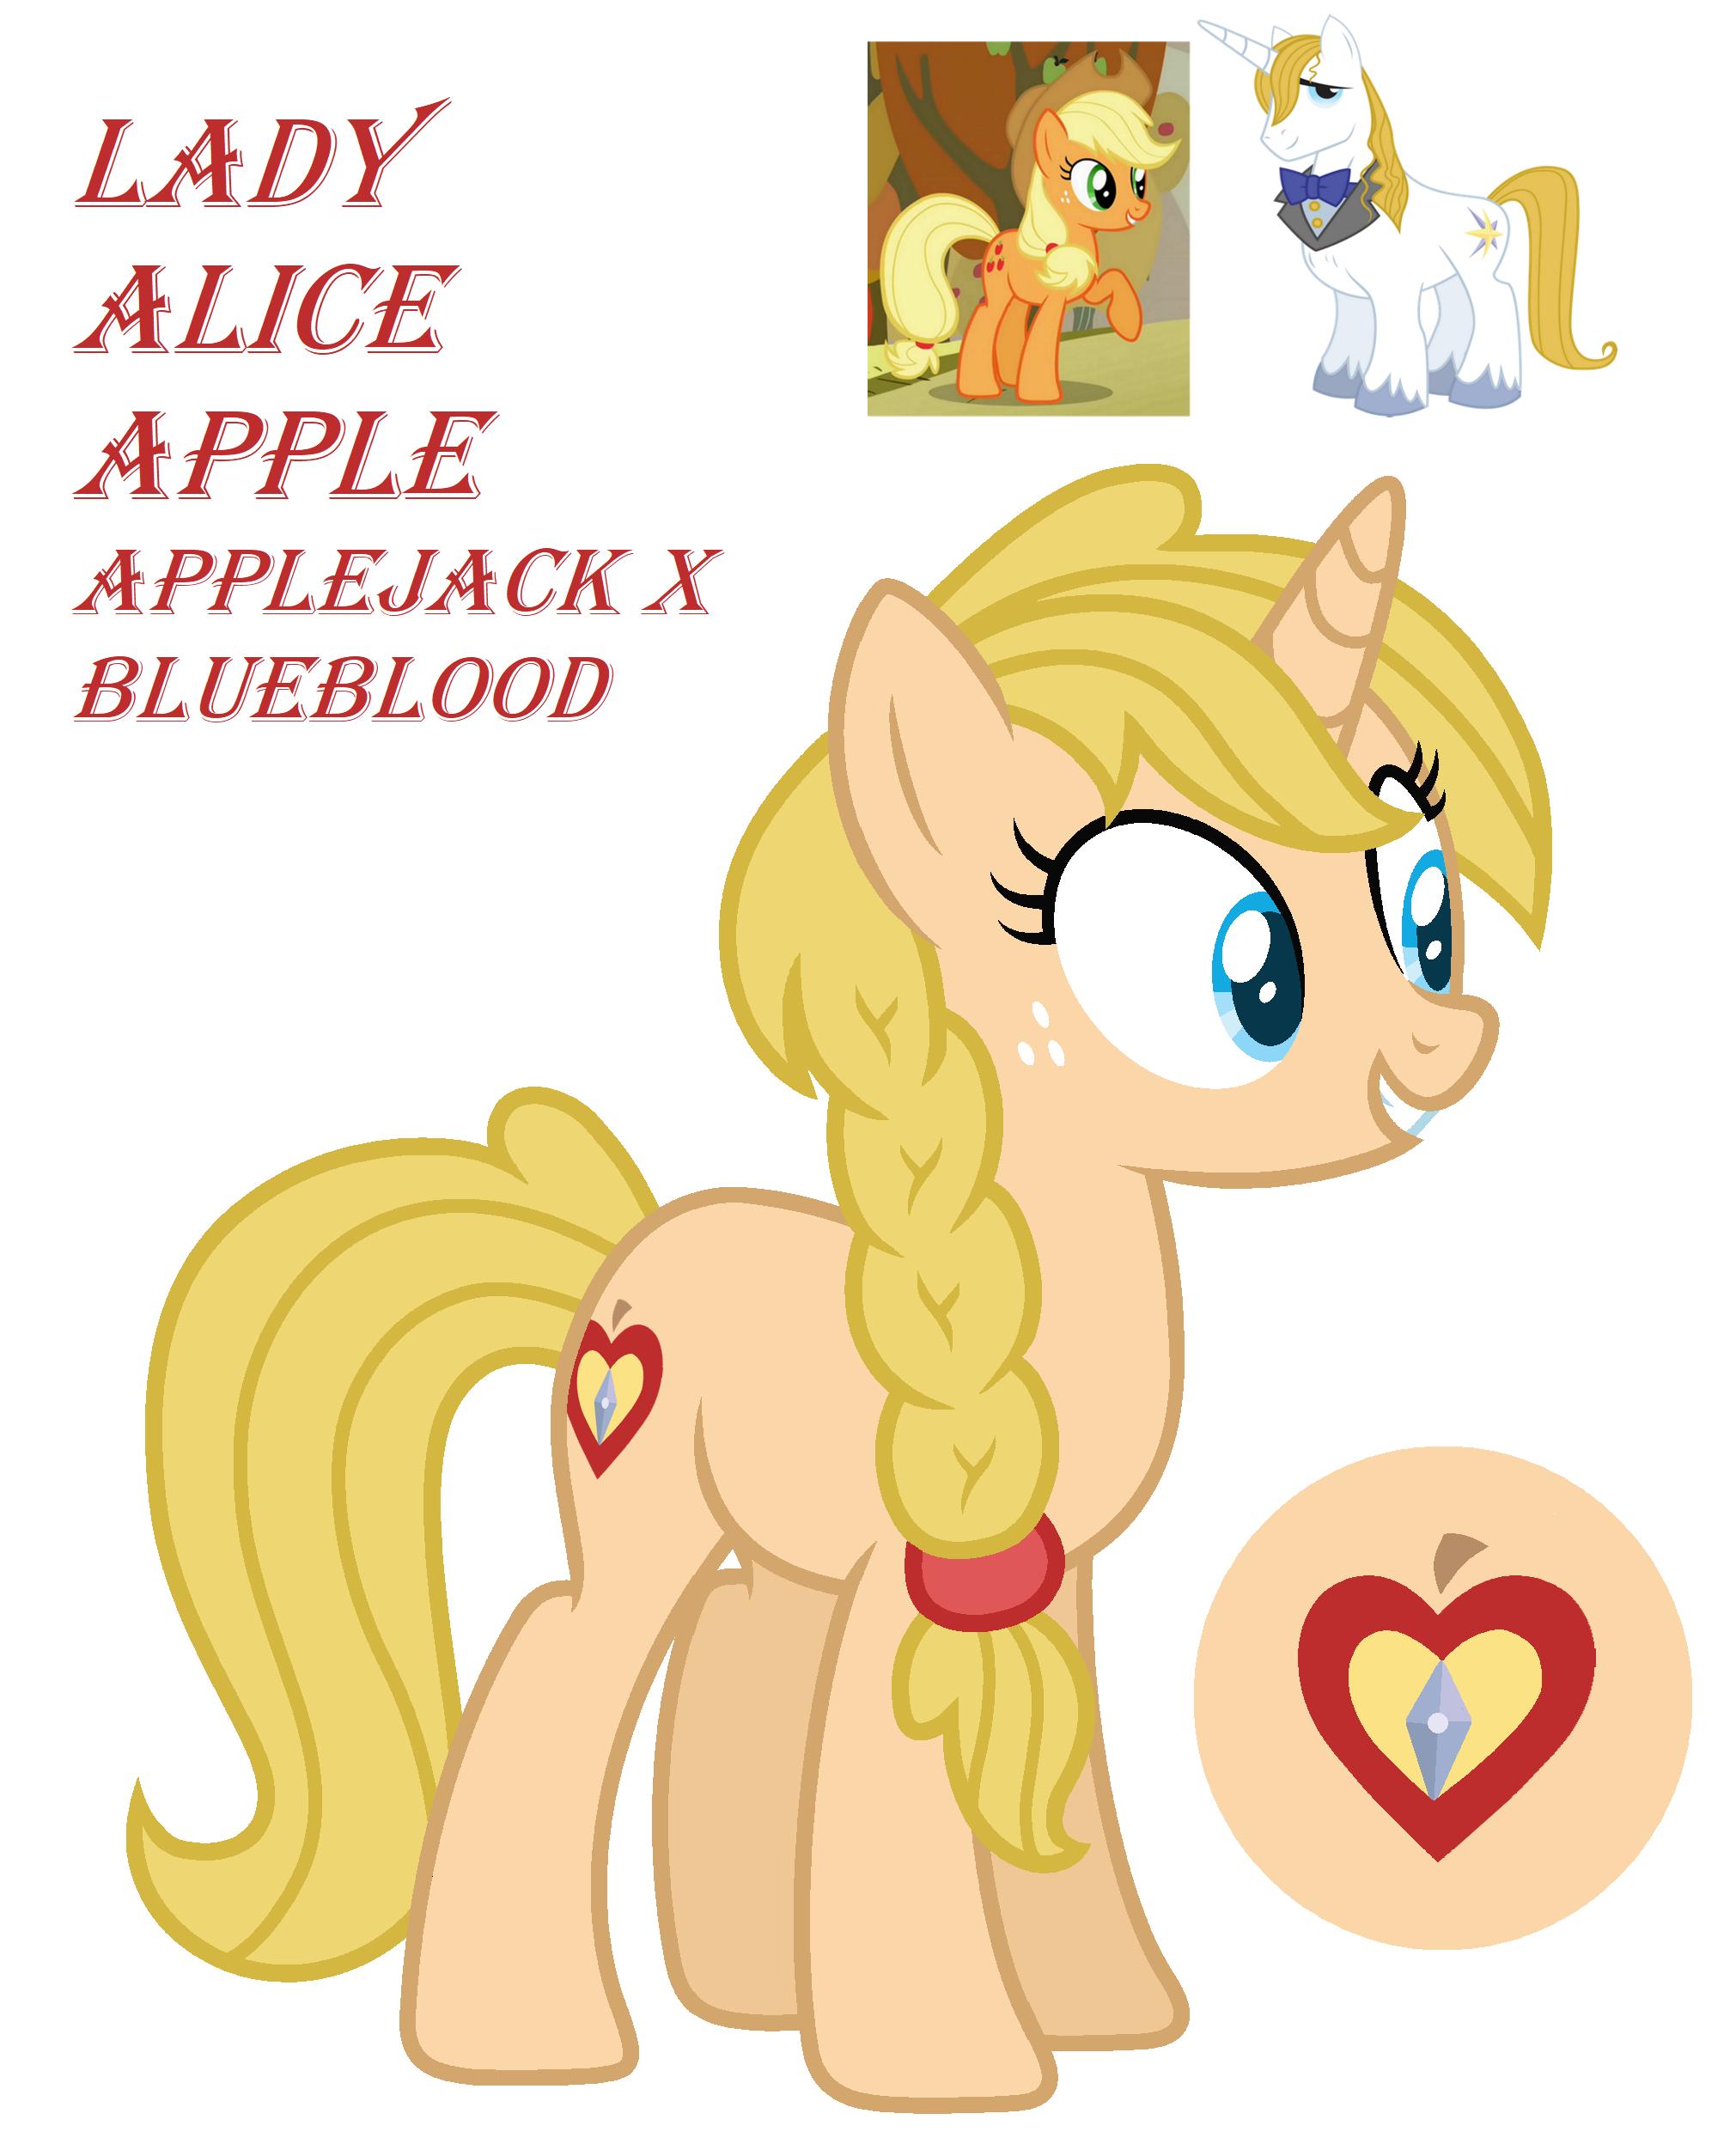 Applejack Parents : applejack, parents, 1882334, Applejack,, Artist:alongcomesmaryann,, Bluejack,, Female,, Male,, Offspring,, Parent:…, Little, Pictures,, Pony,, Friendship